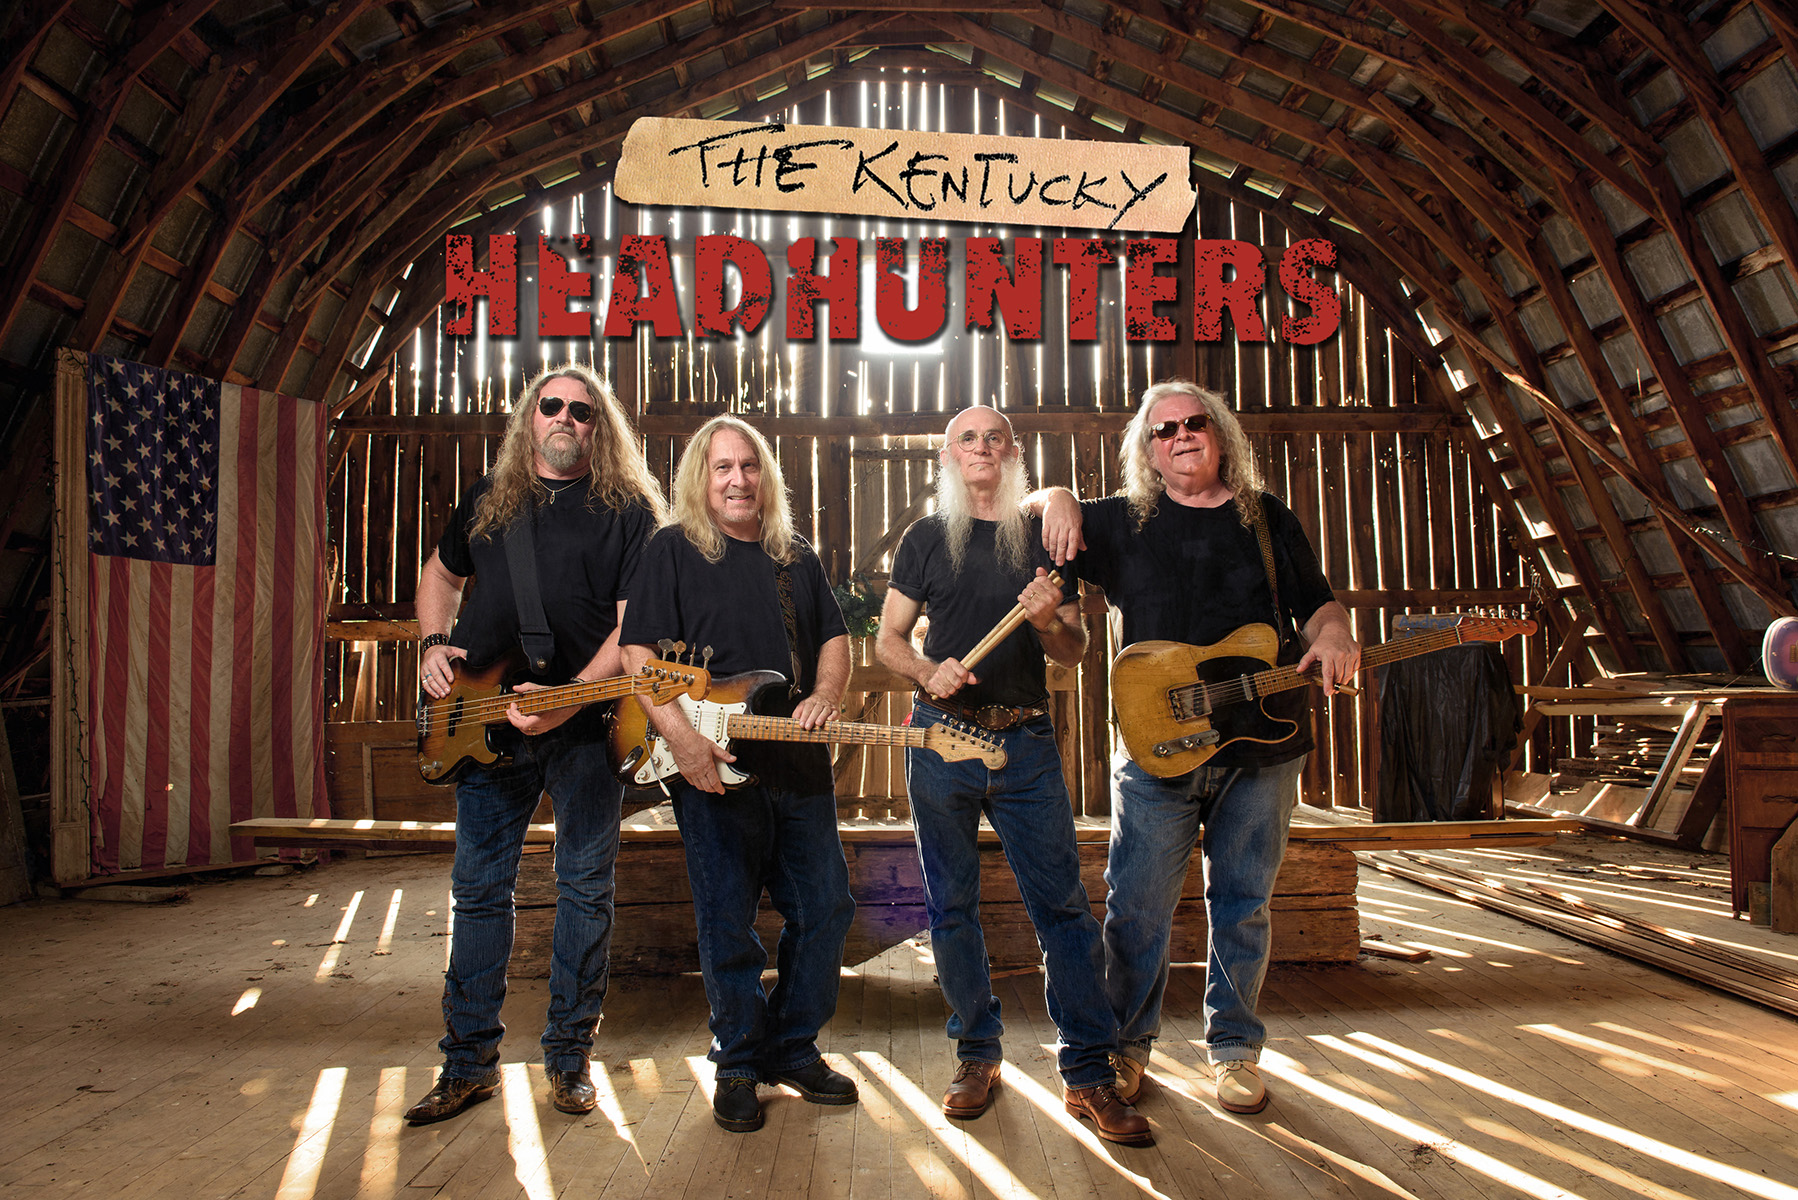 kentucky headhunters.jpg